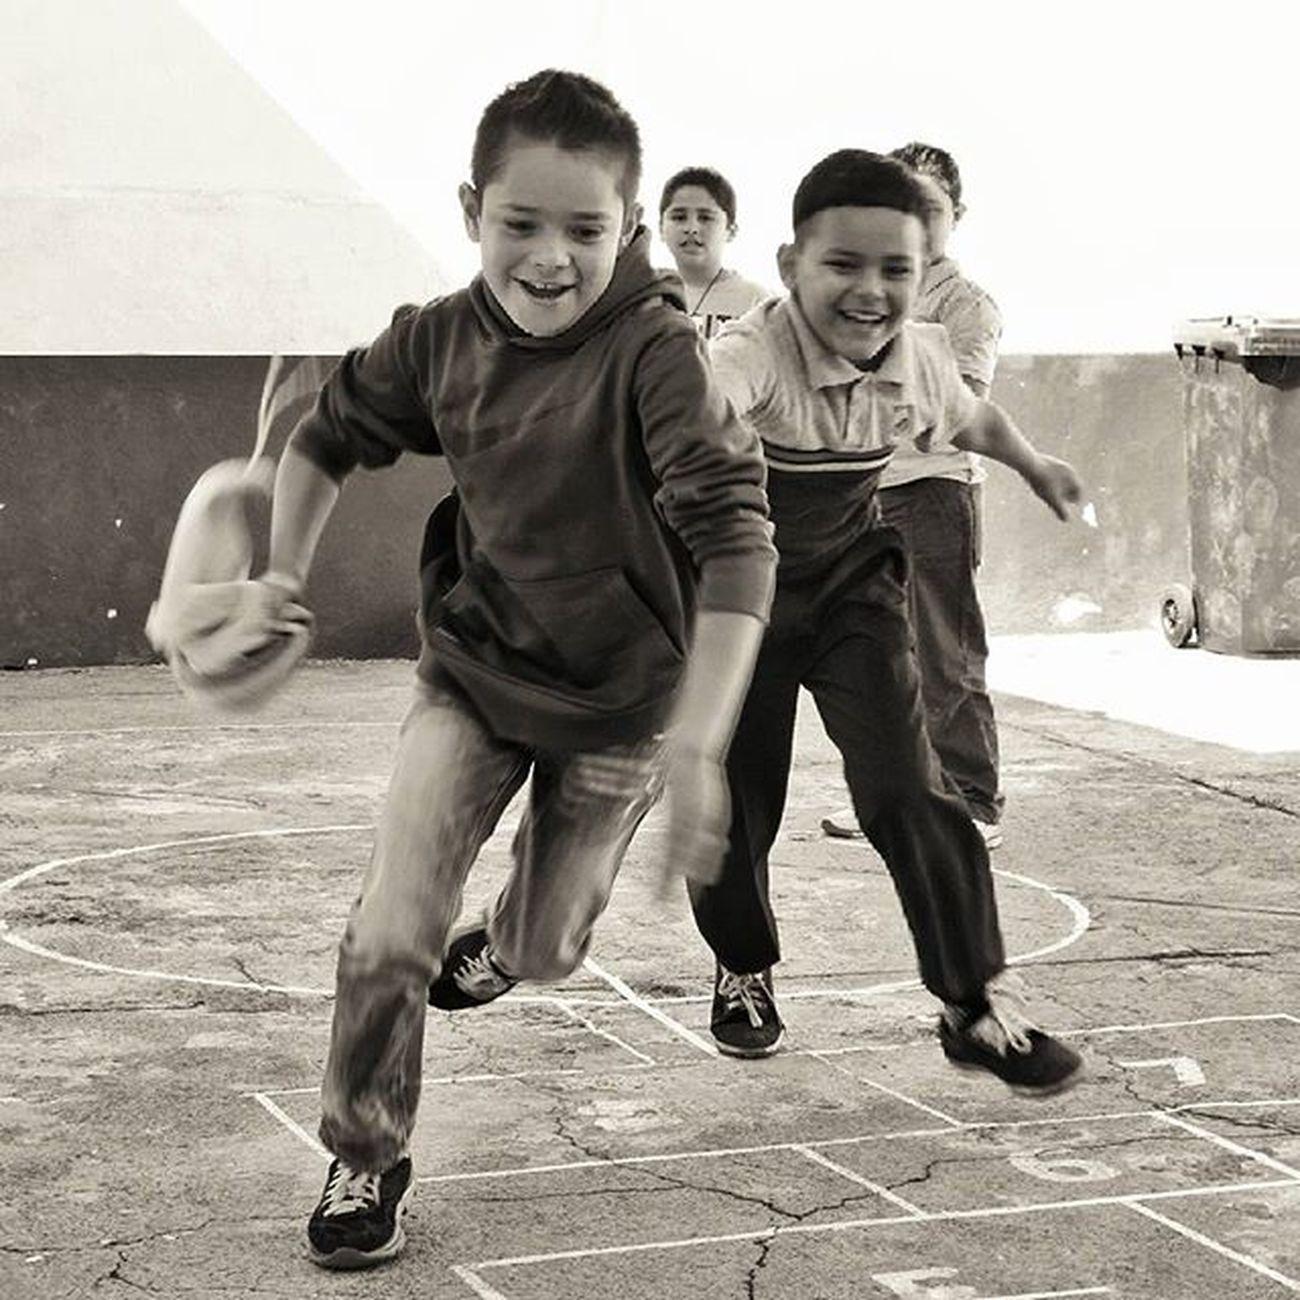 Infancia Jalisco POTD Photooftheday Instamood Blancoynegro Niñosfelices Instakids